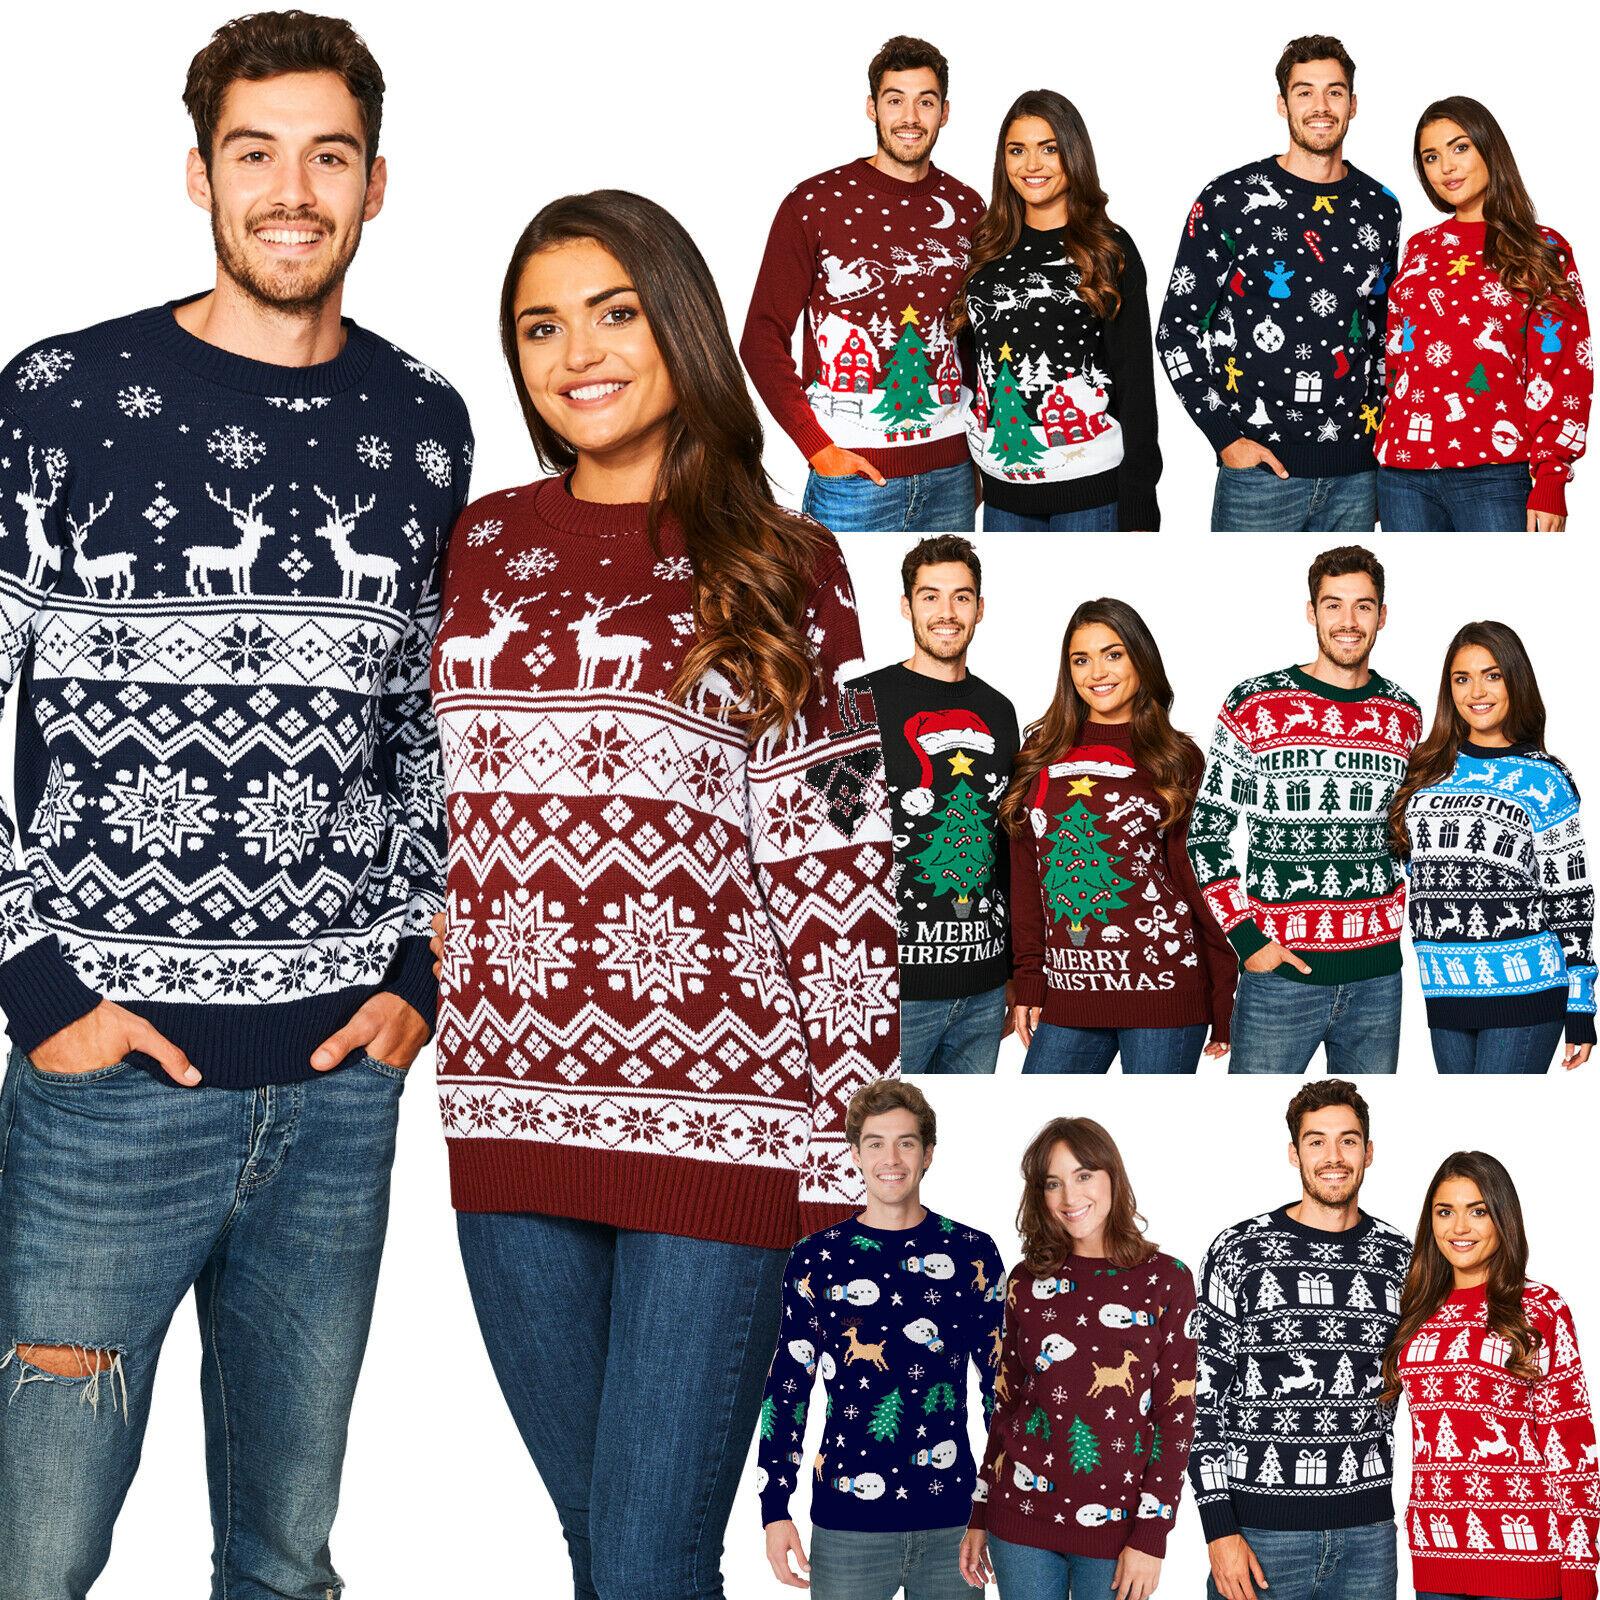 New Unisex Men Women Santa Xmas Christmas Novelty Fairisle Retro Jumper Sweater £9.99 at ebay newcampltd